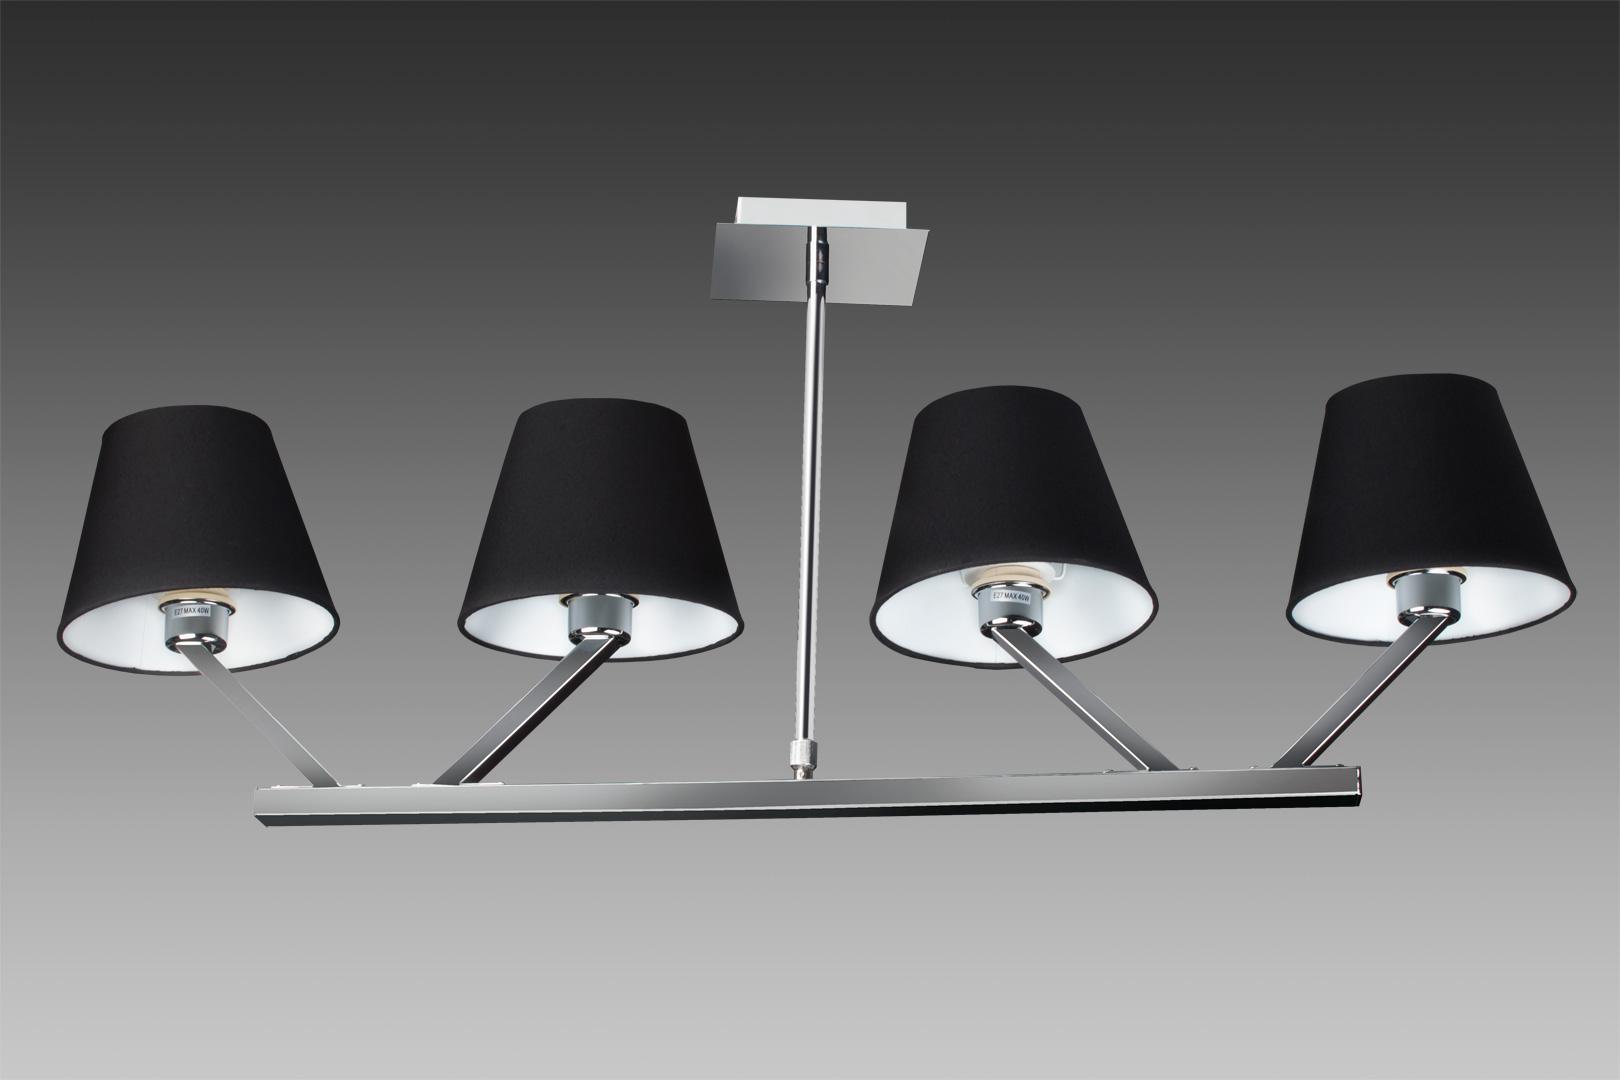 Závěsné svítidlo Maxlight Orlando 4 5103/4A/BK